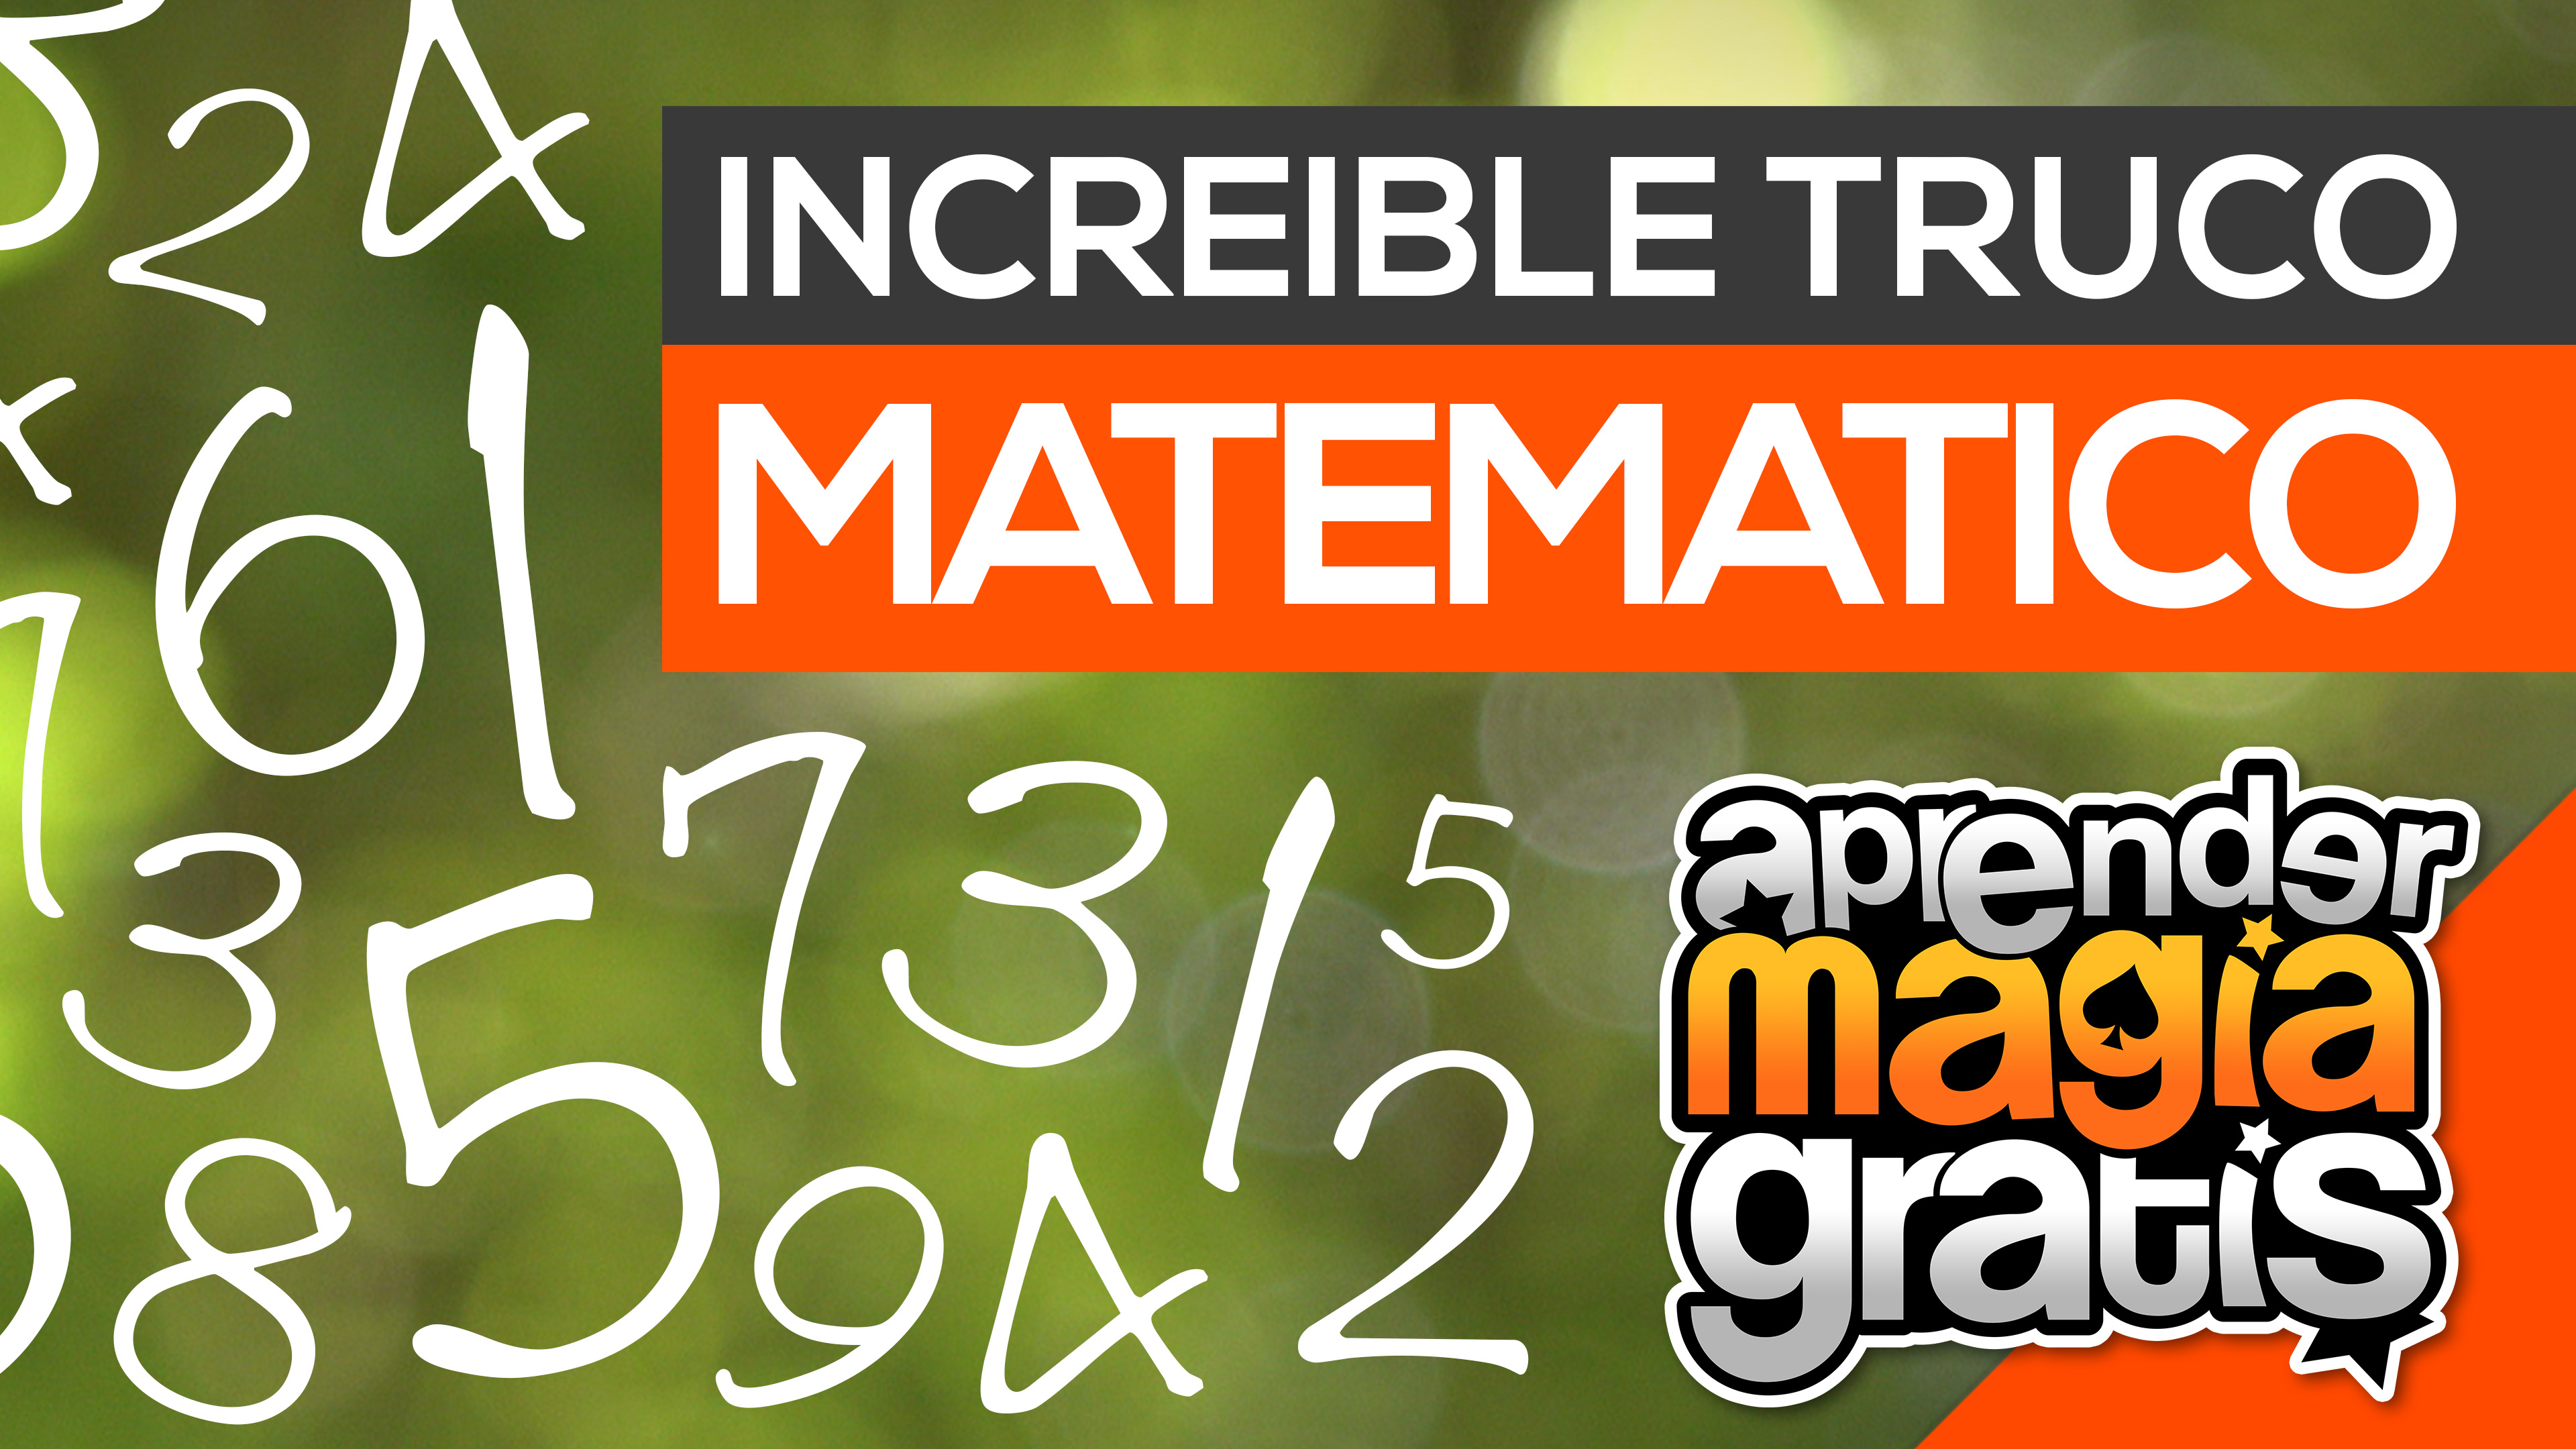 2016 - 05 - truco matematico